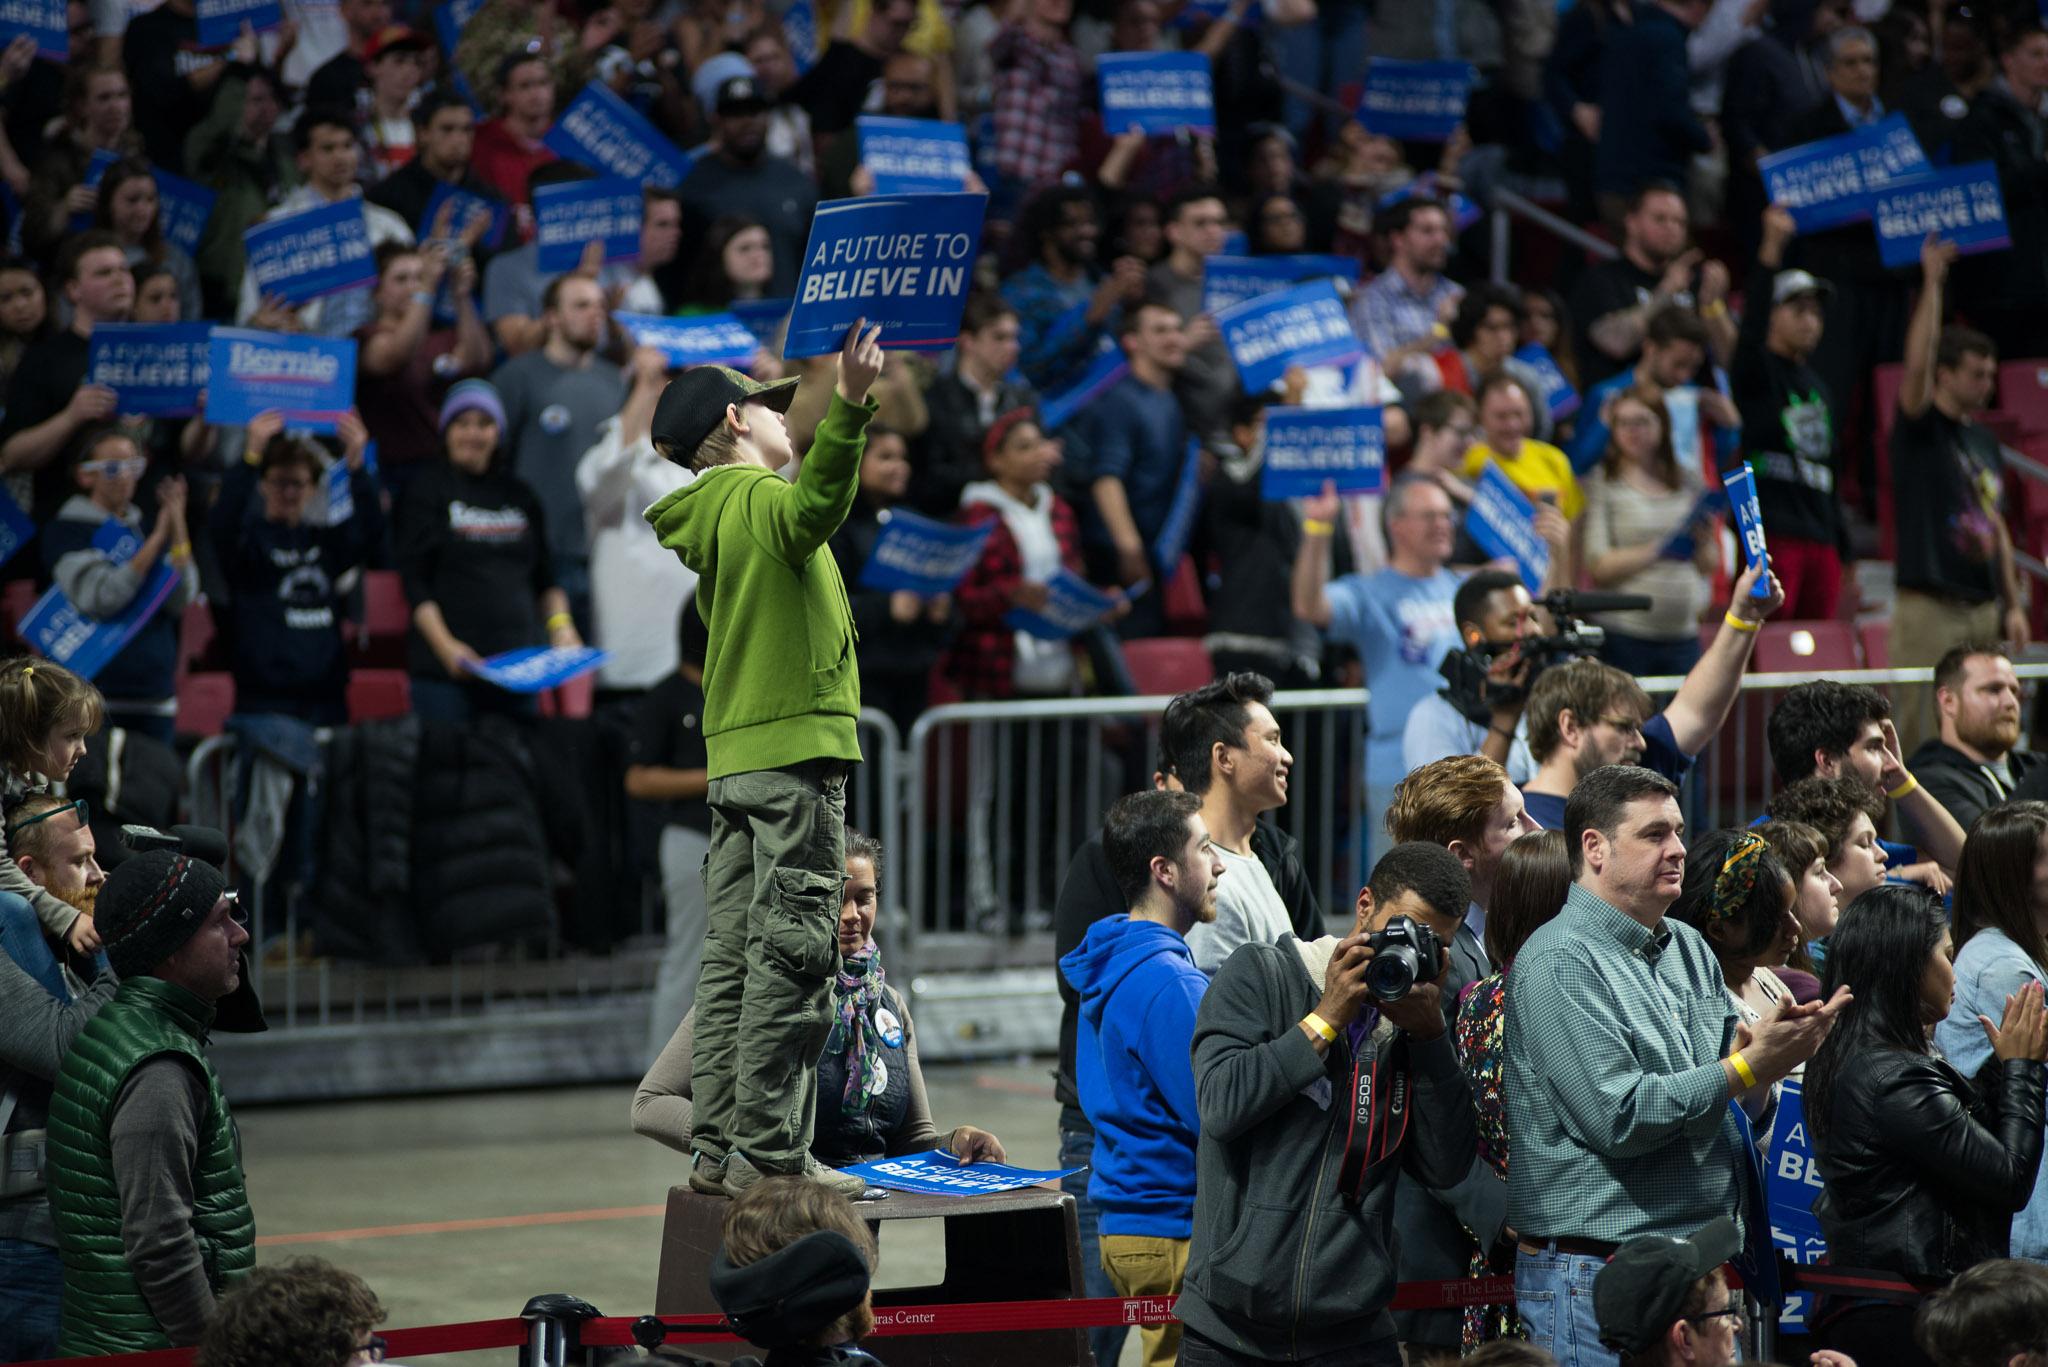 Bernie-Sanders-Philadelphia-Jeremy-Jeziorski-2016-04-06-web-39.jpg